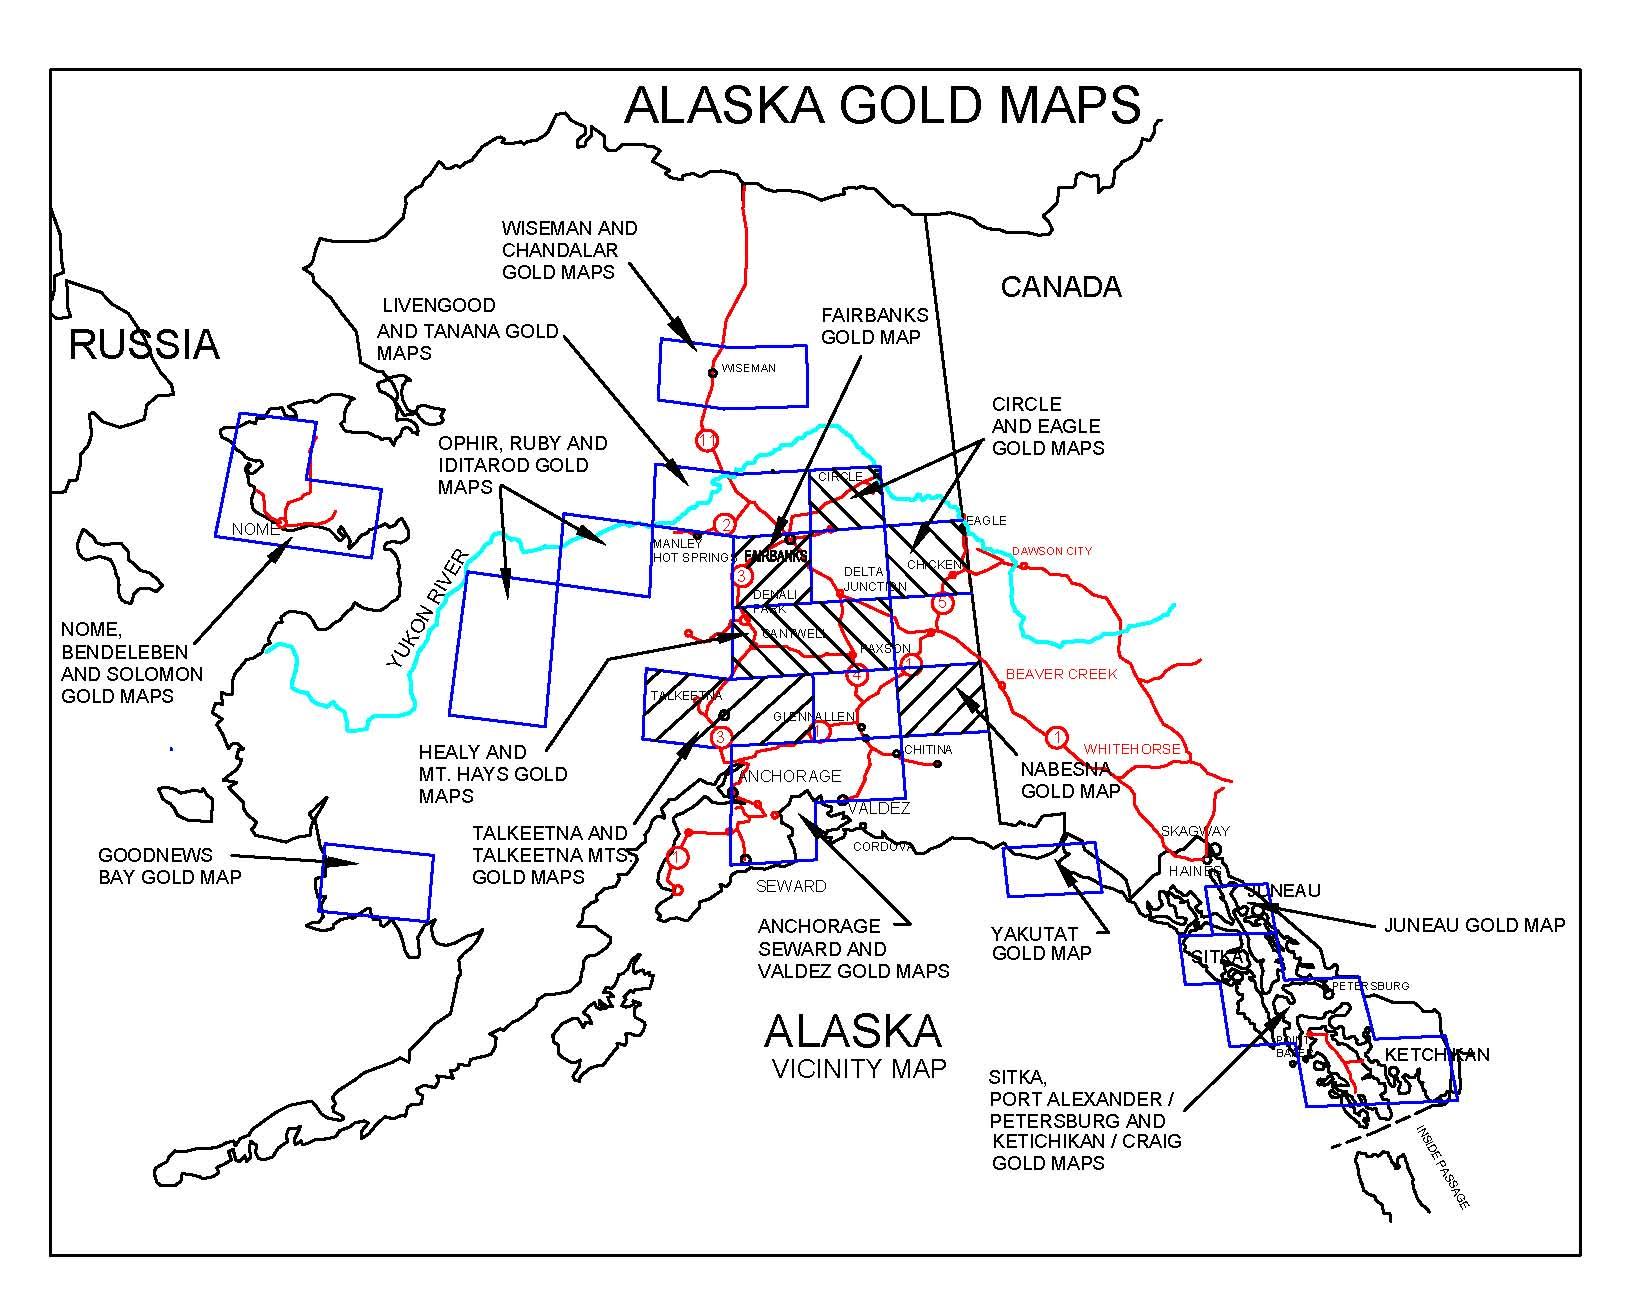 ALASKA GOLD MAPS, ALASKA GOLD PANNING, ALASKA GOLD PROSPECTING